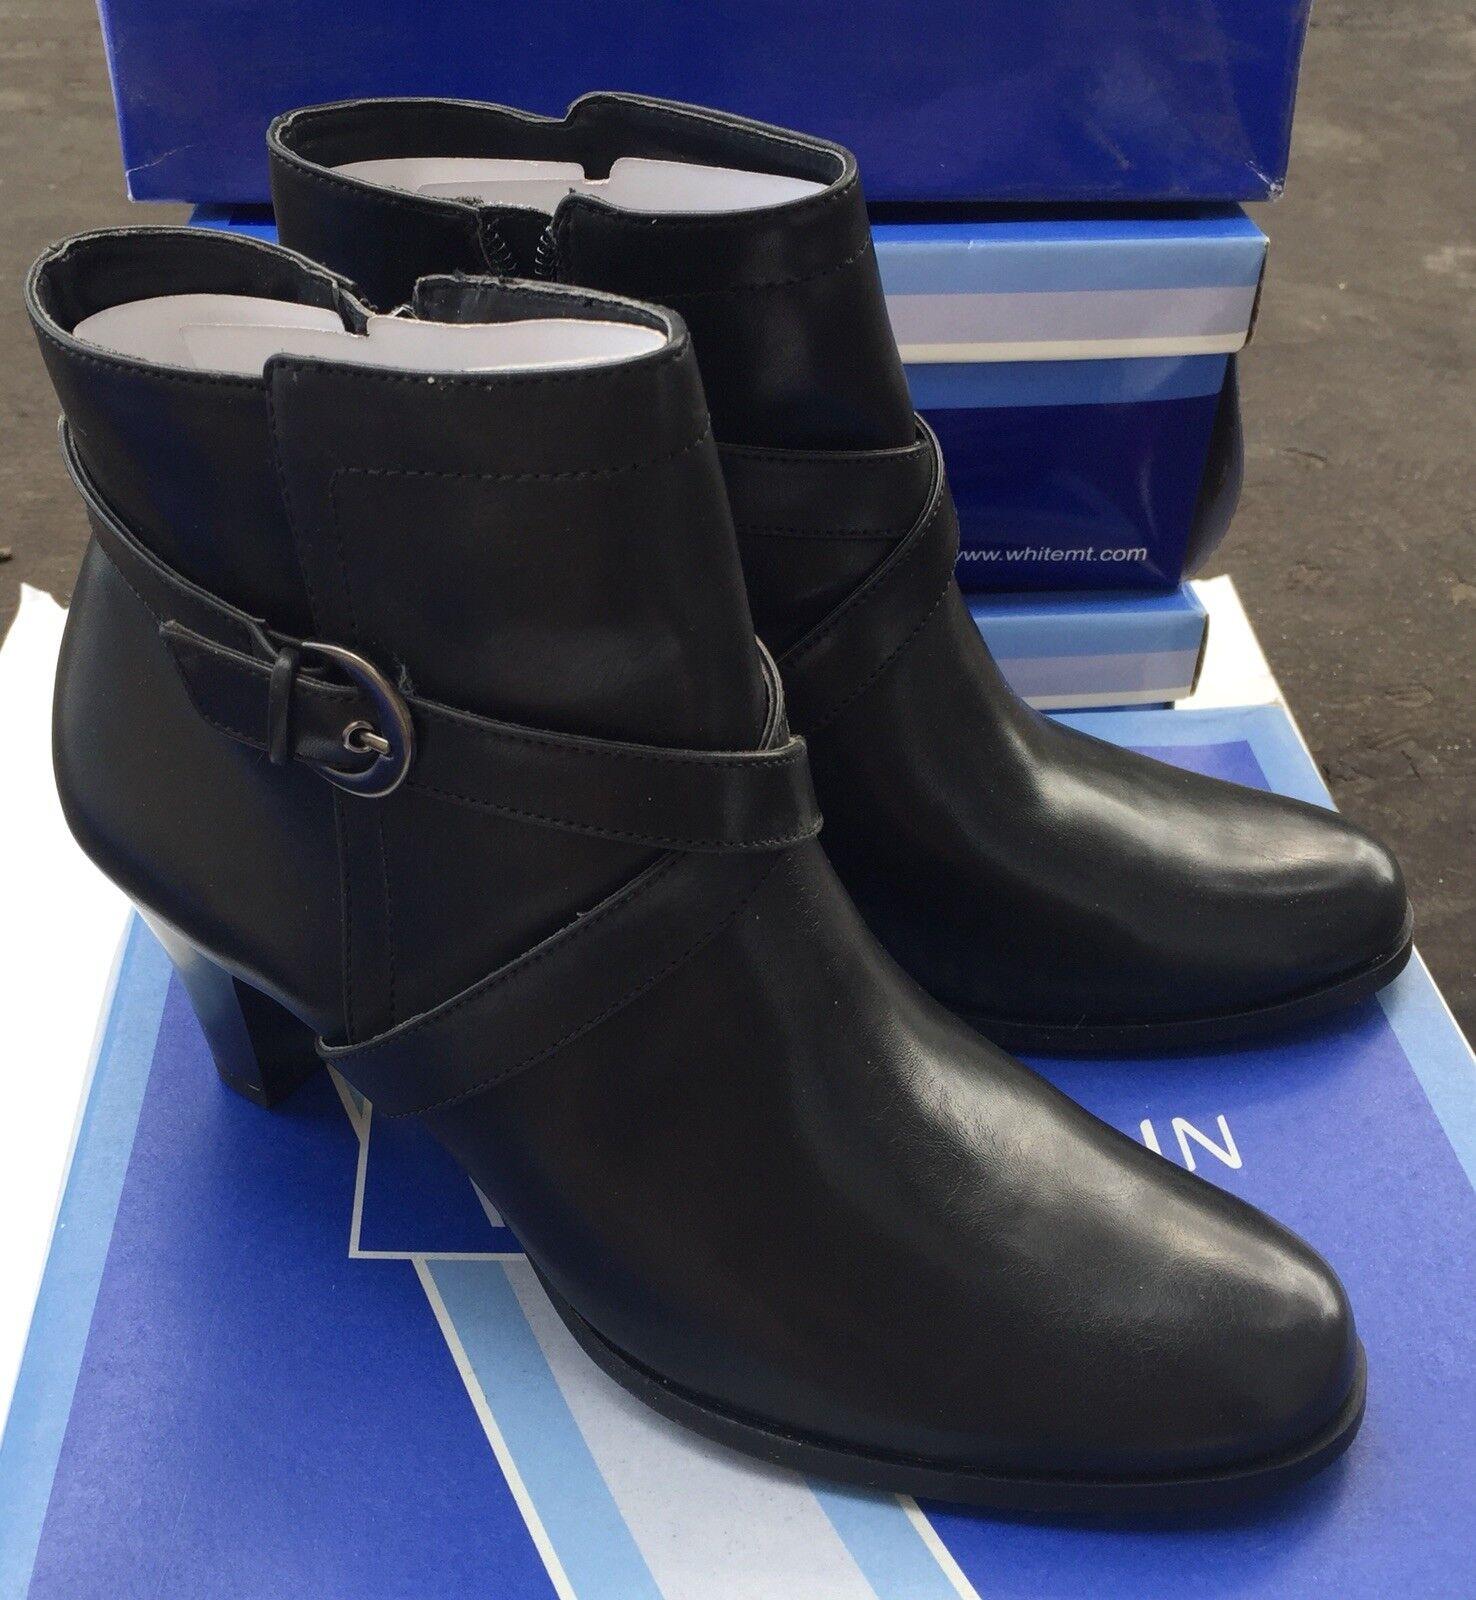 White Mountain Kiosk Womans Ankle Boots Sz 8 Black New In Box